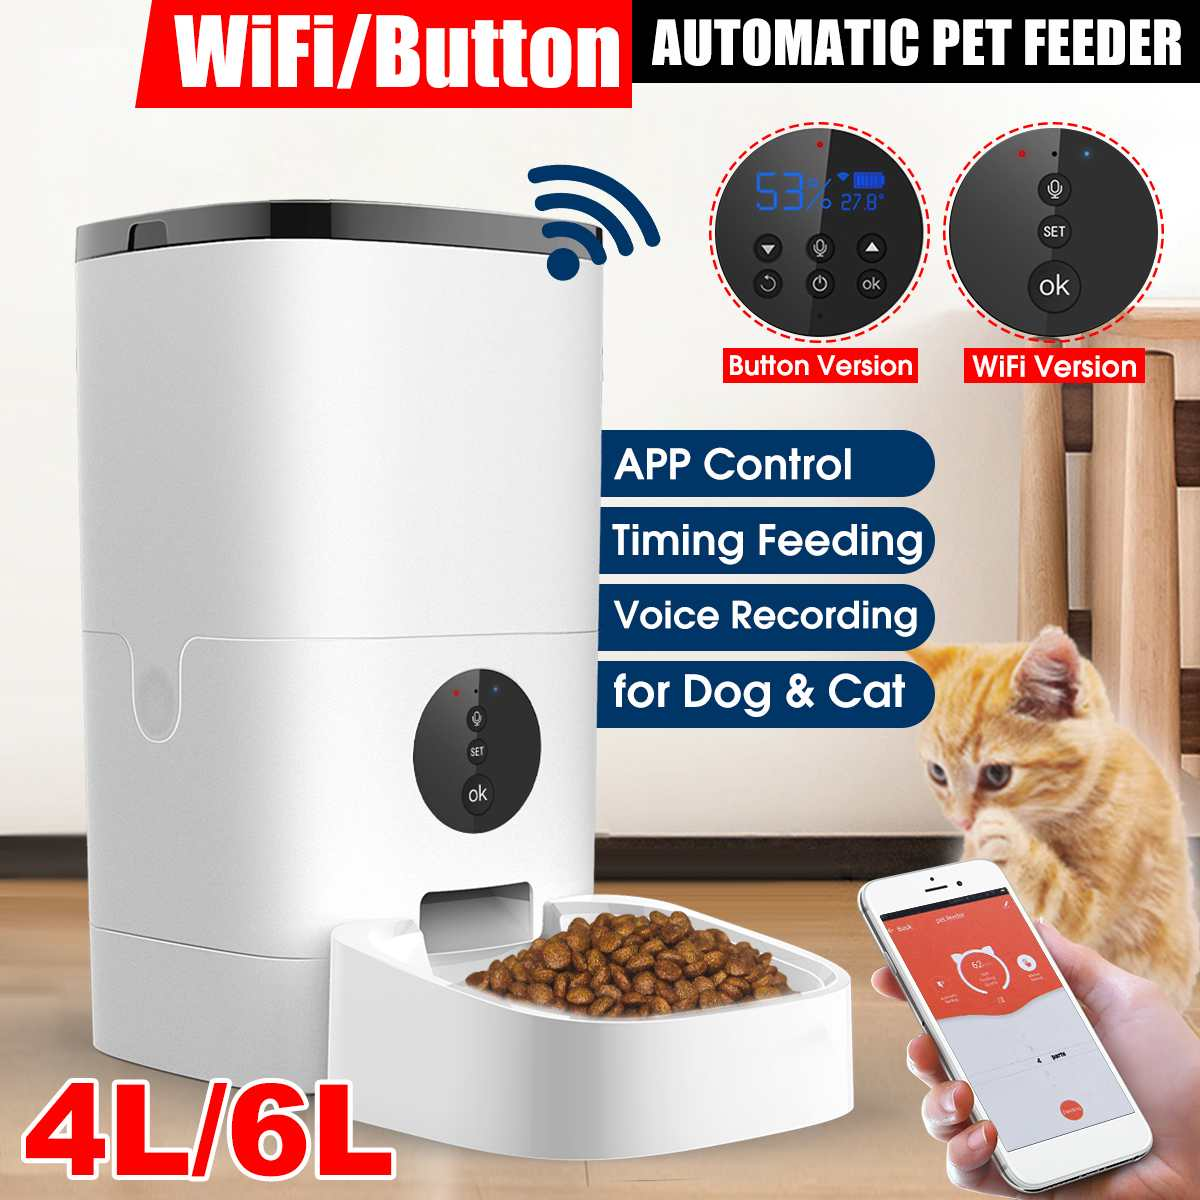 Wifi Button Version 4l 6l Automatic Pet Feeder Smart Cat Dog Food Dispenser Remote Control App Shopee Philippines